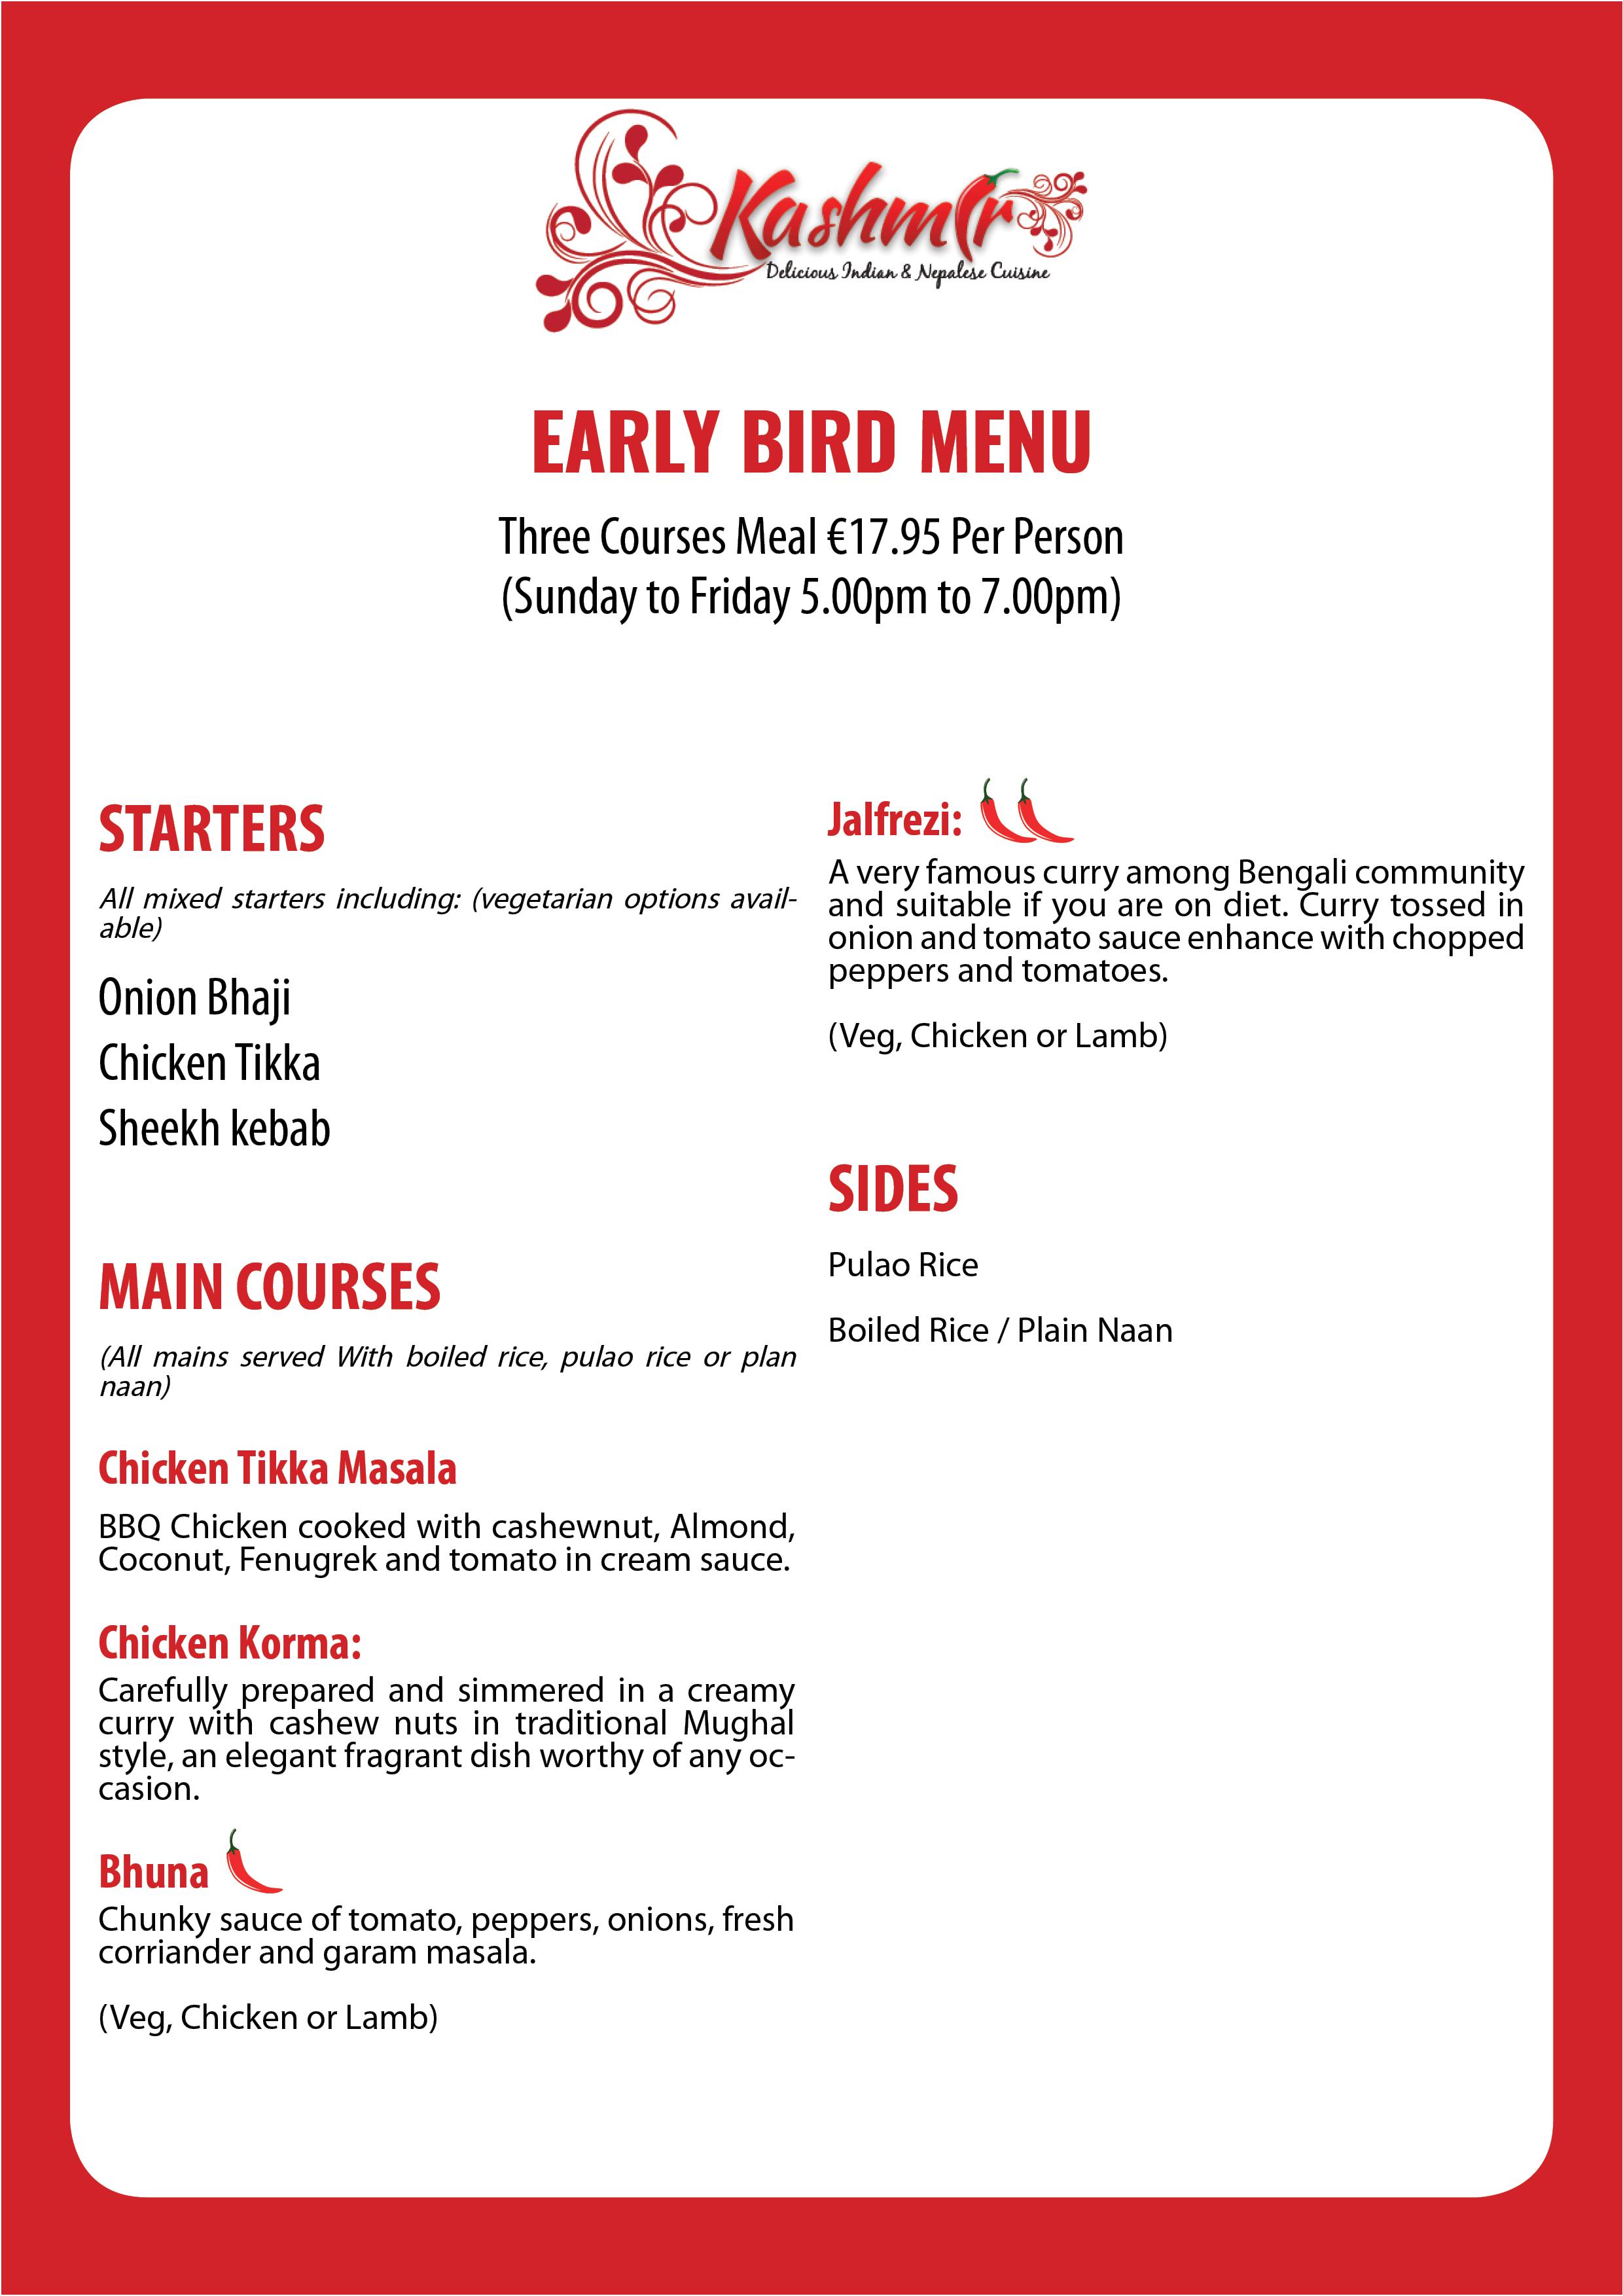 Kashmir Restaurant Galway Ealry Burd Menu.